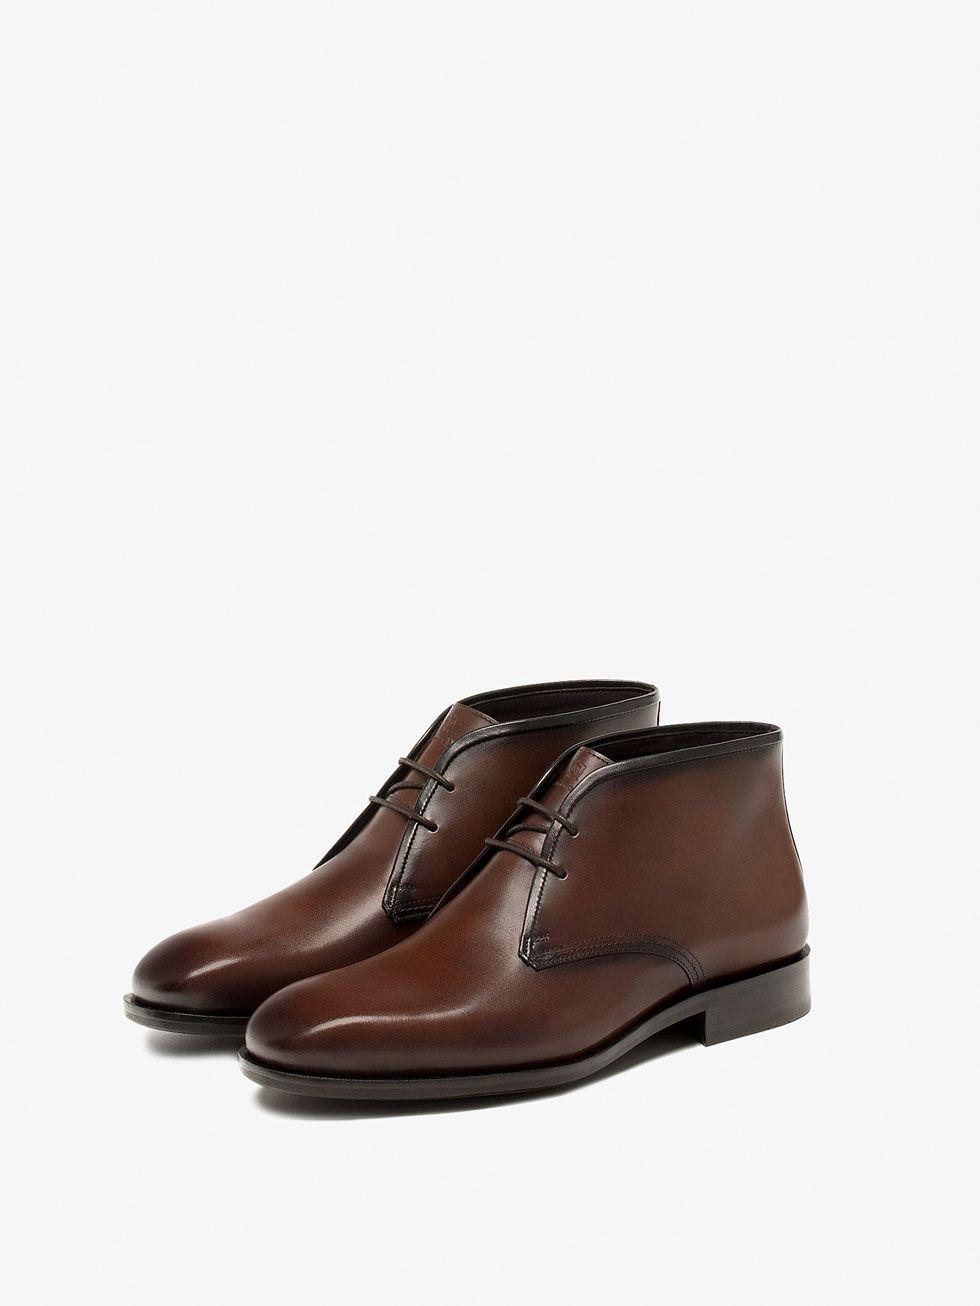 bbf1be57313fa Ver todo - Zapatos - HOMBRE - Massimo Dutti Mexico